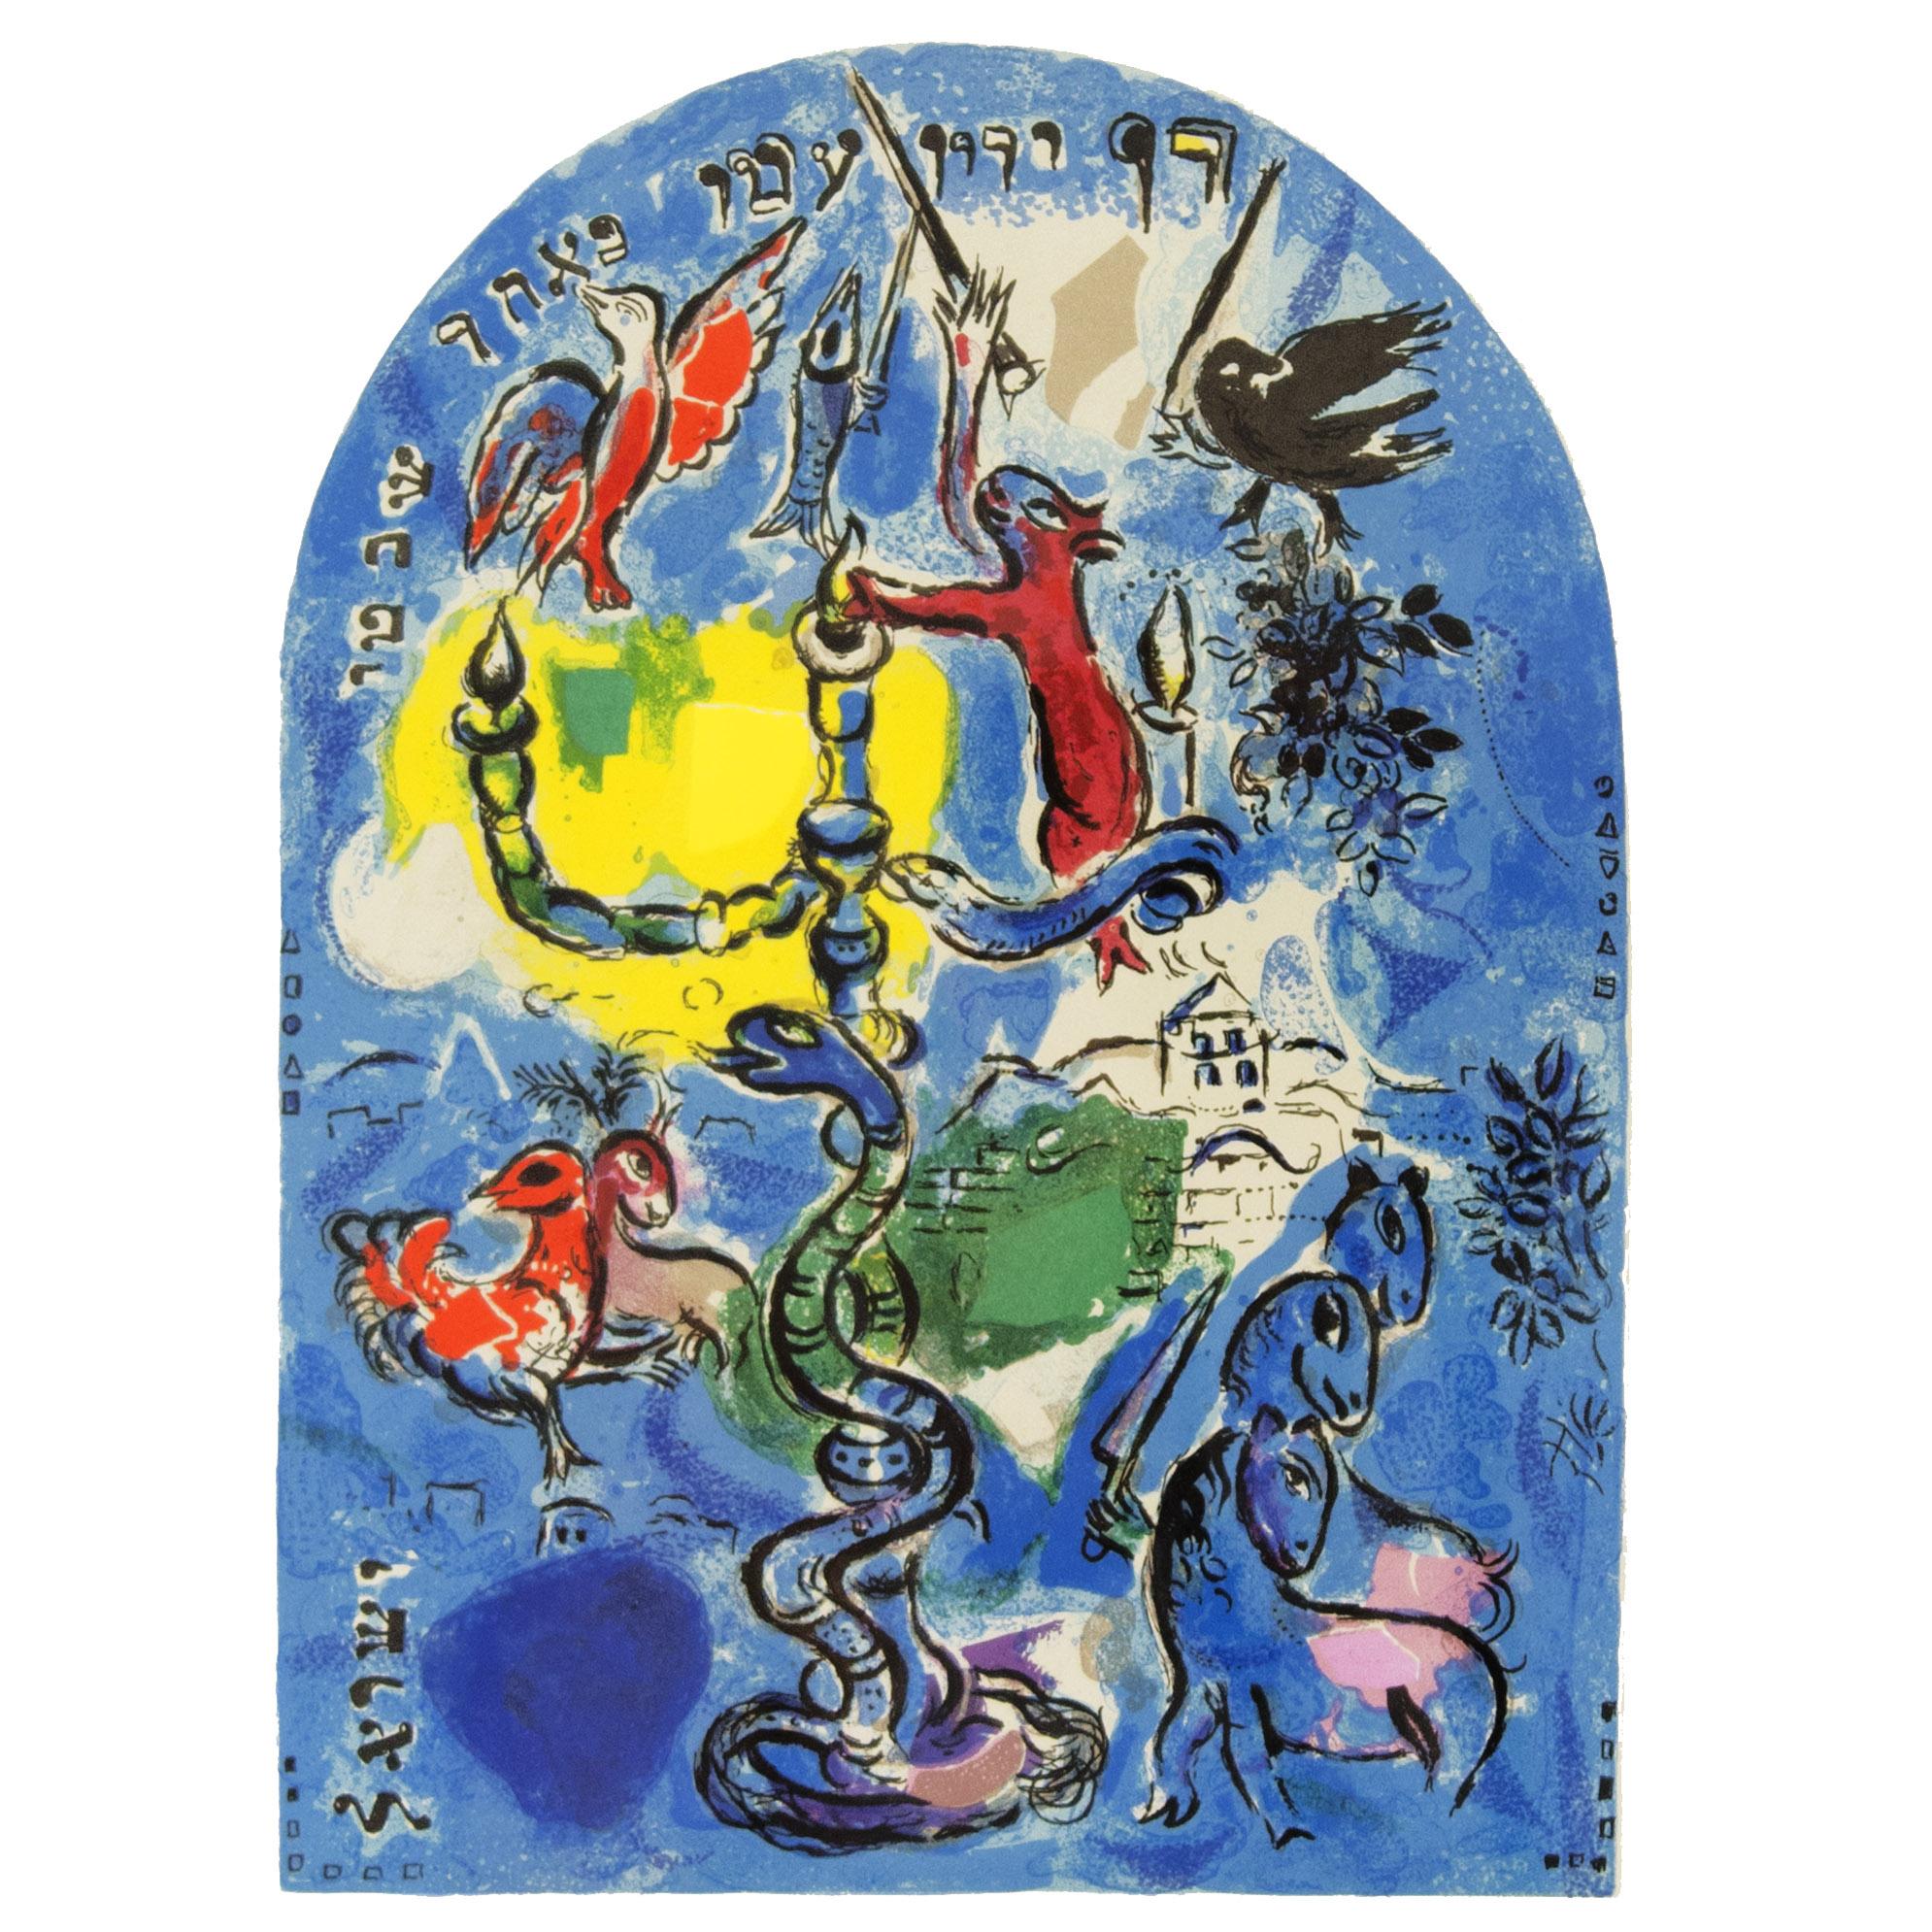 chagall-marc-tribe-of-dan-jerusalem-windows-fifth-state-lithograph-unframed-web.jpg